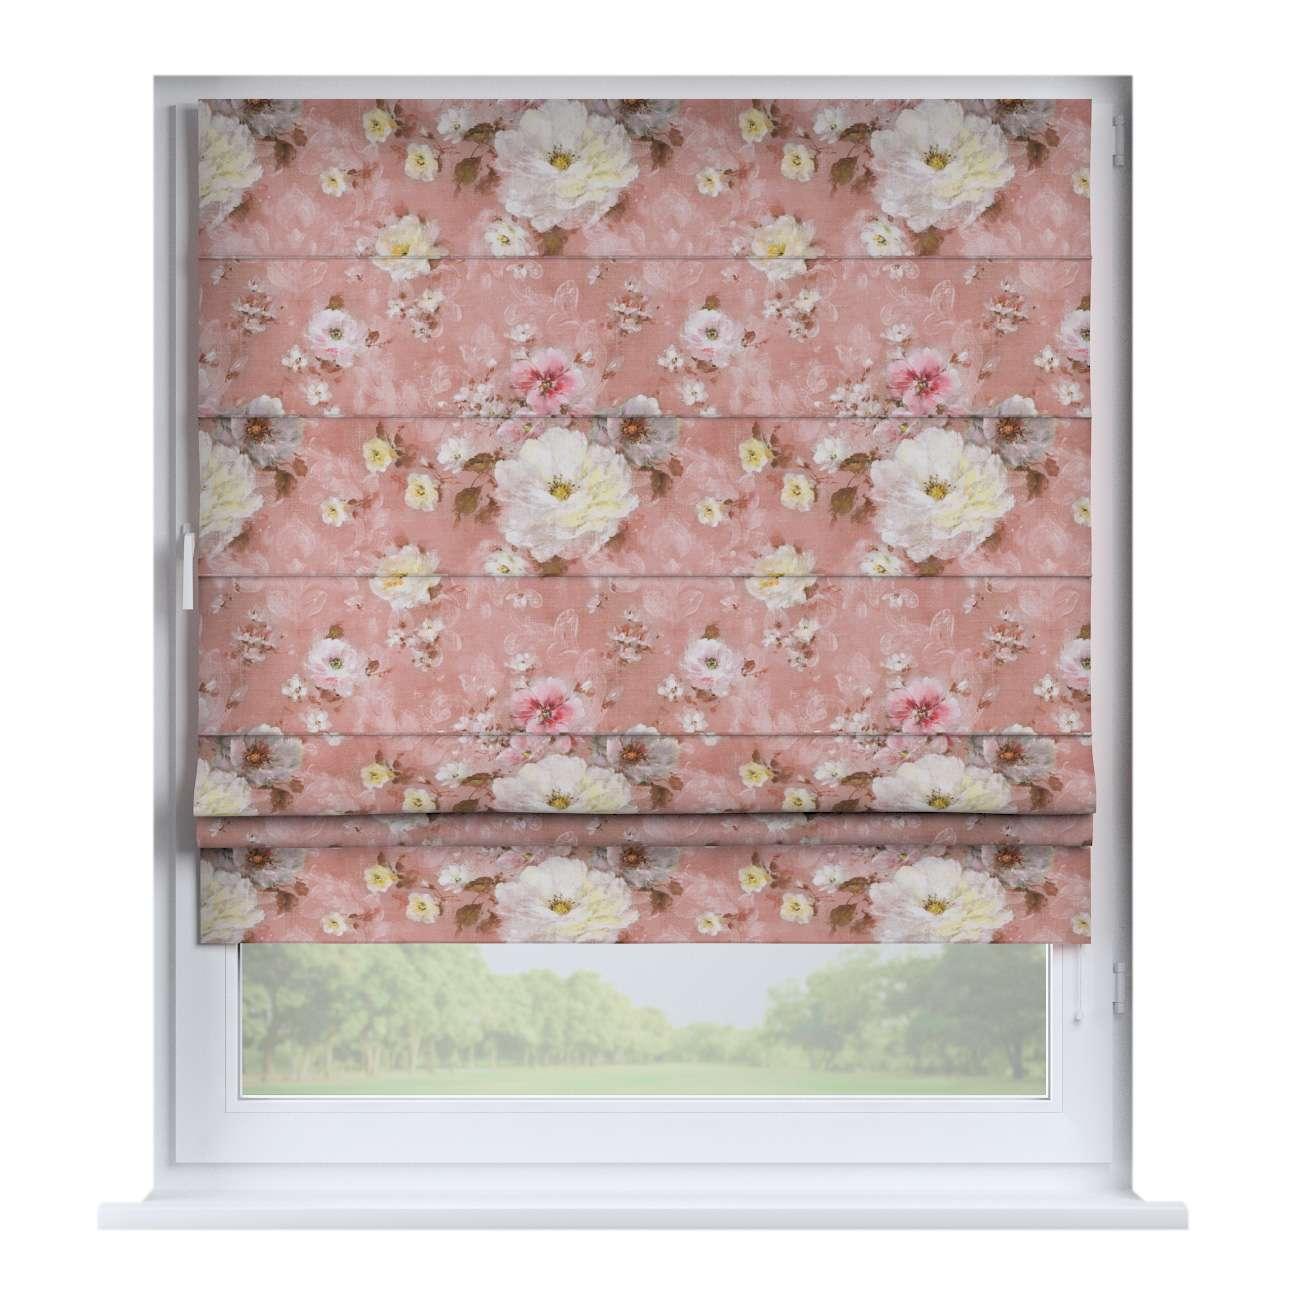 Romanetės Padva 80 x 170 cm (plotis x ilgis) kolekcijoje Monet, audinys: 137-83